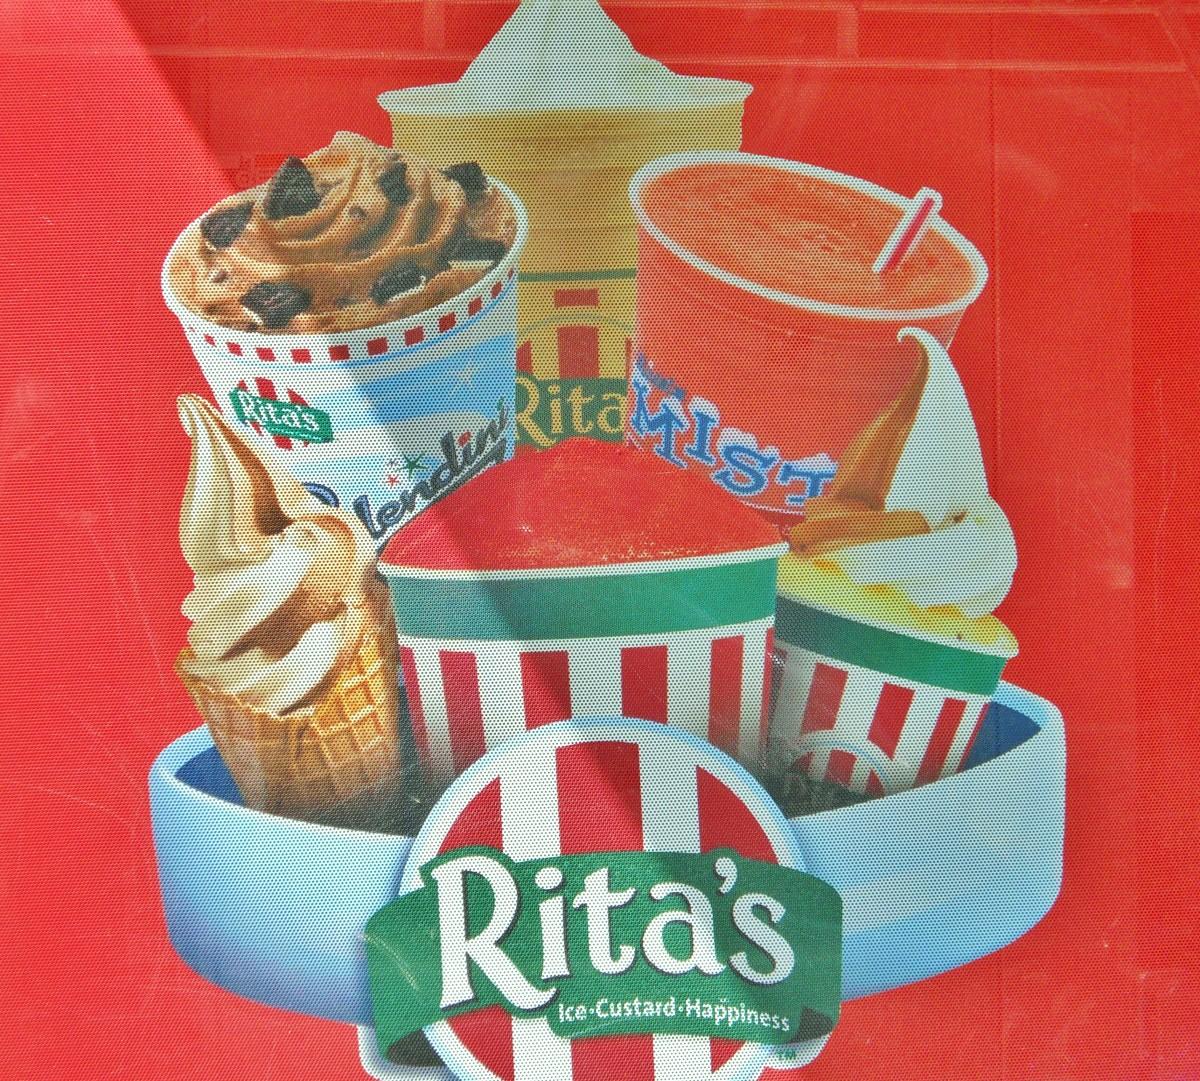 ice-cream-lovers-guide-to-hilton-head-island